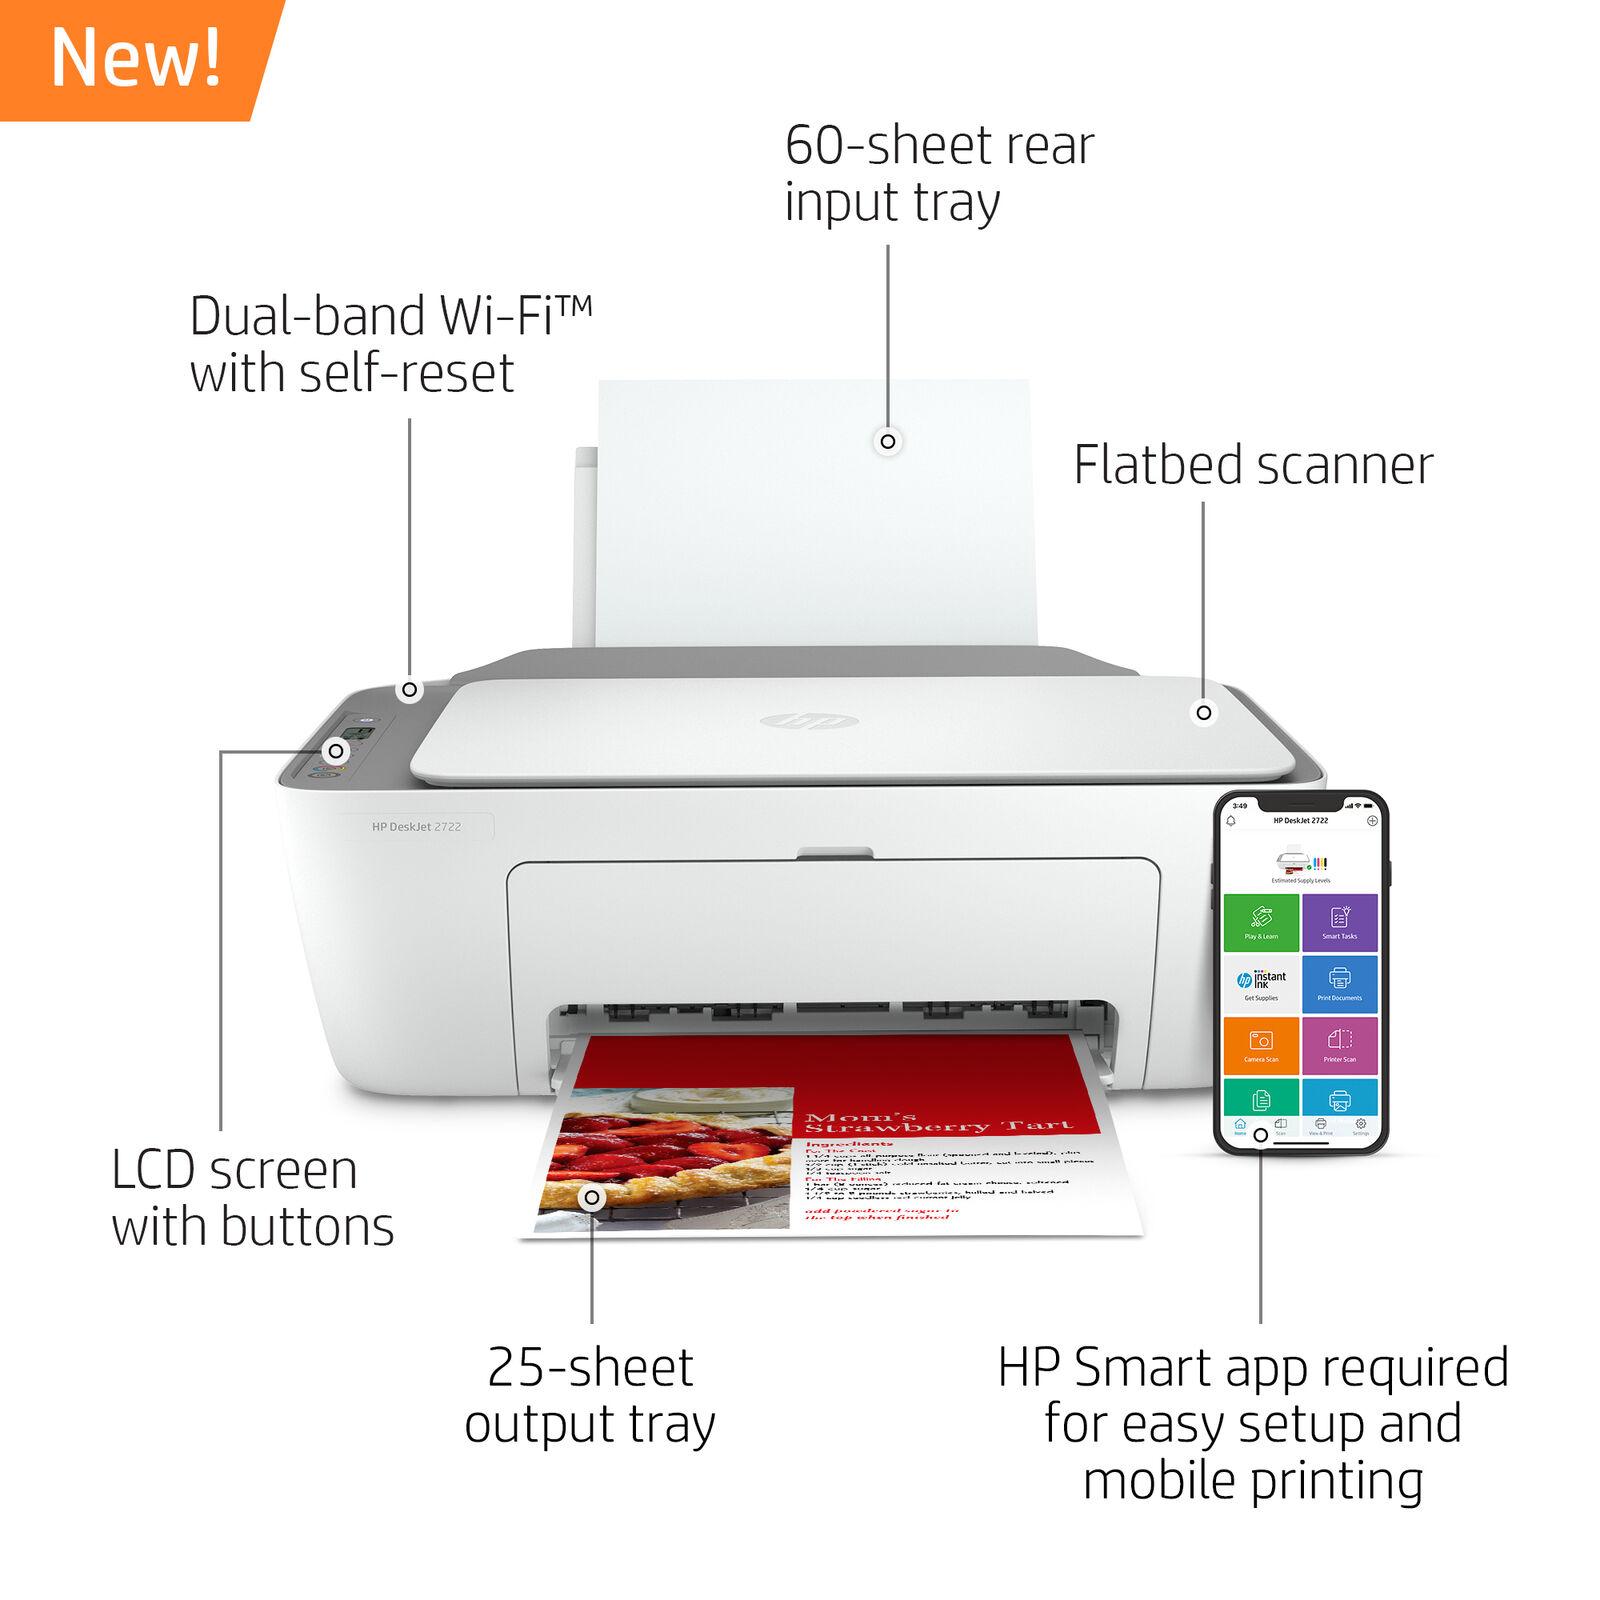 New HP DeskJet 2722 All in One Wireless Color Inkjet Printer